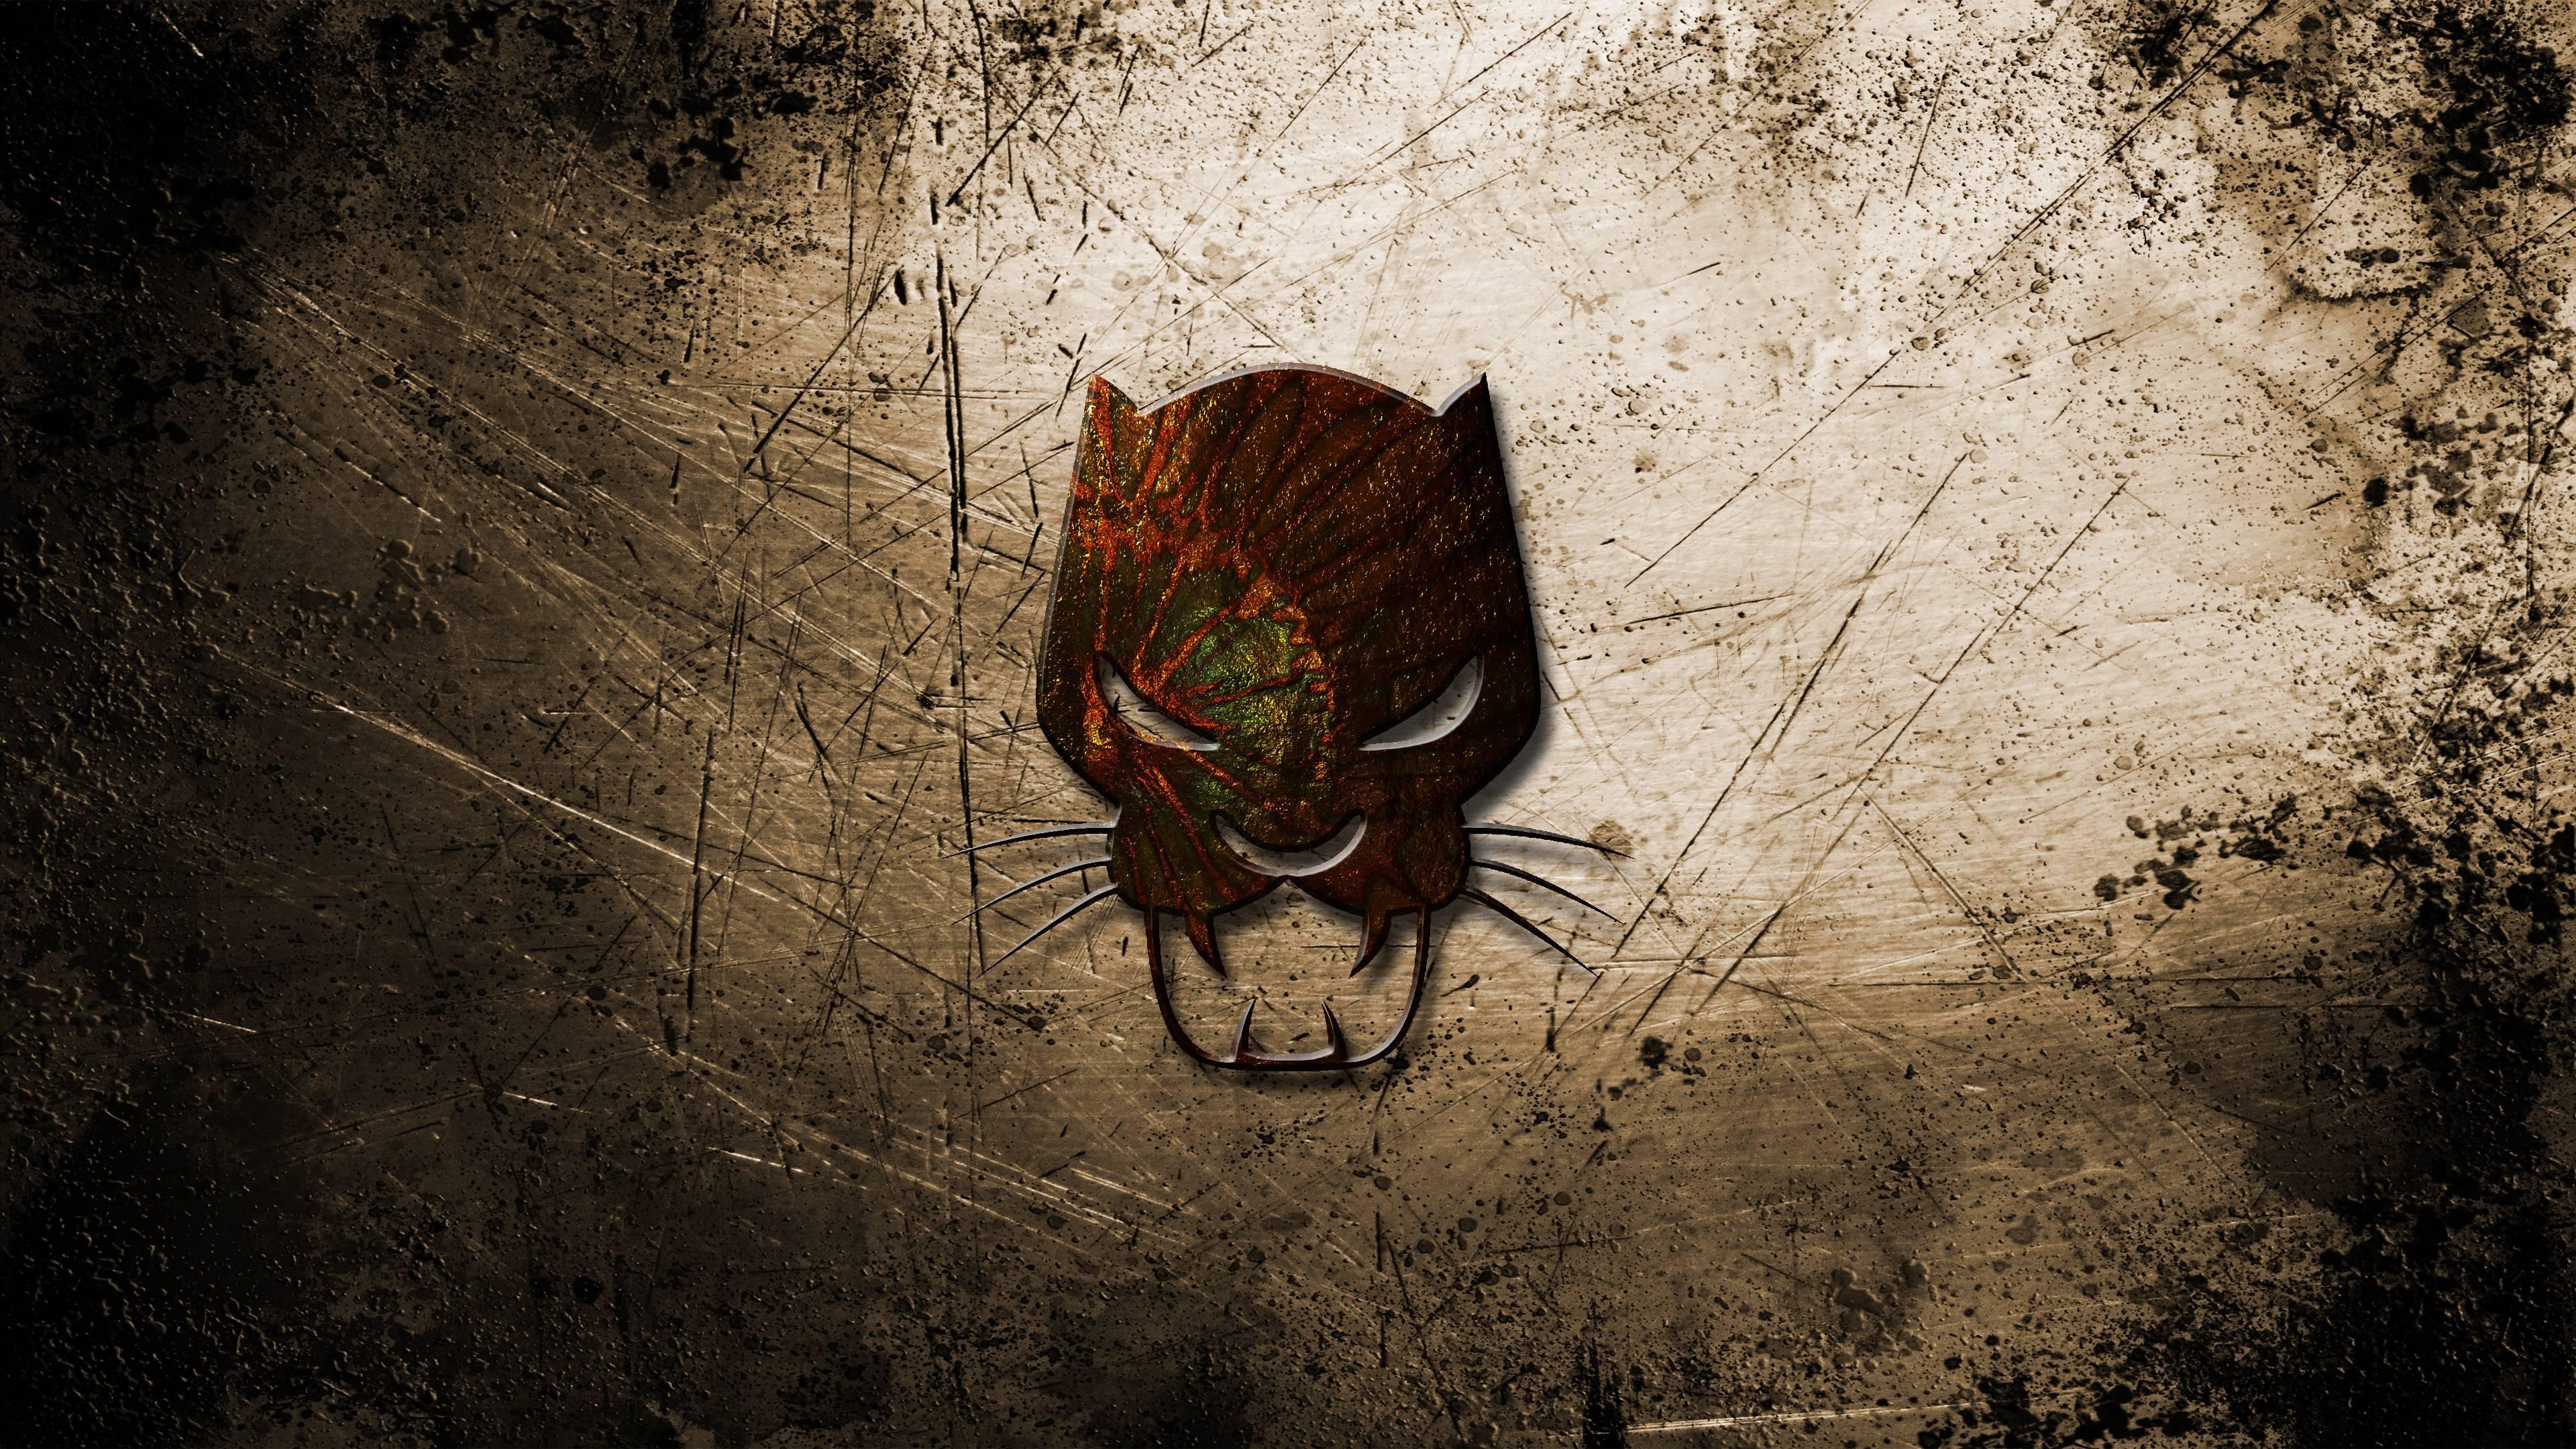 Black Panther Marvel Comic Comics 3840x2160 hdweweb4com 3840x2160